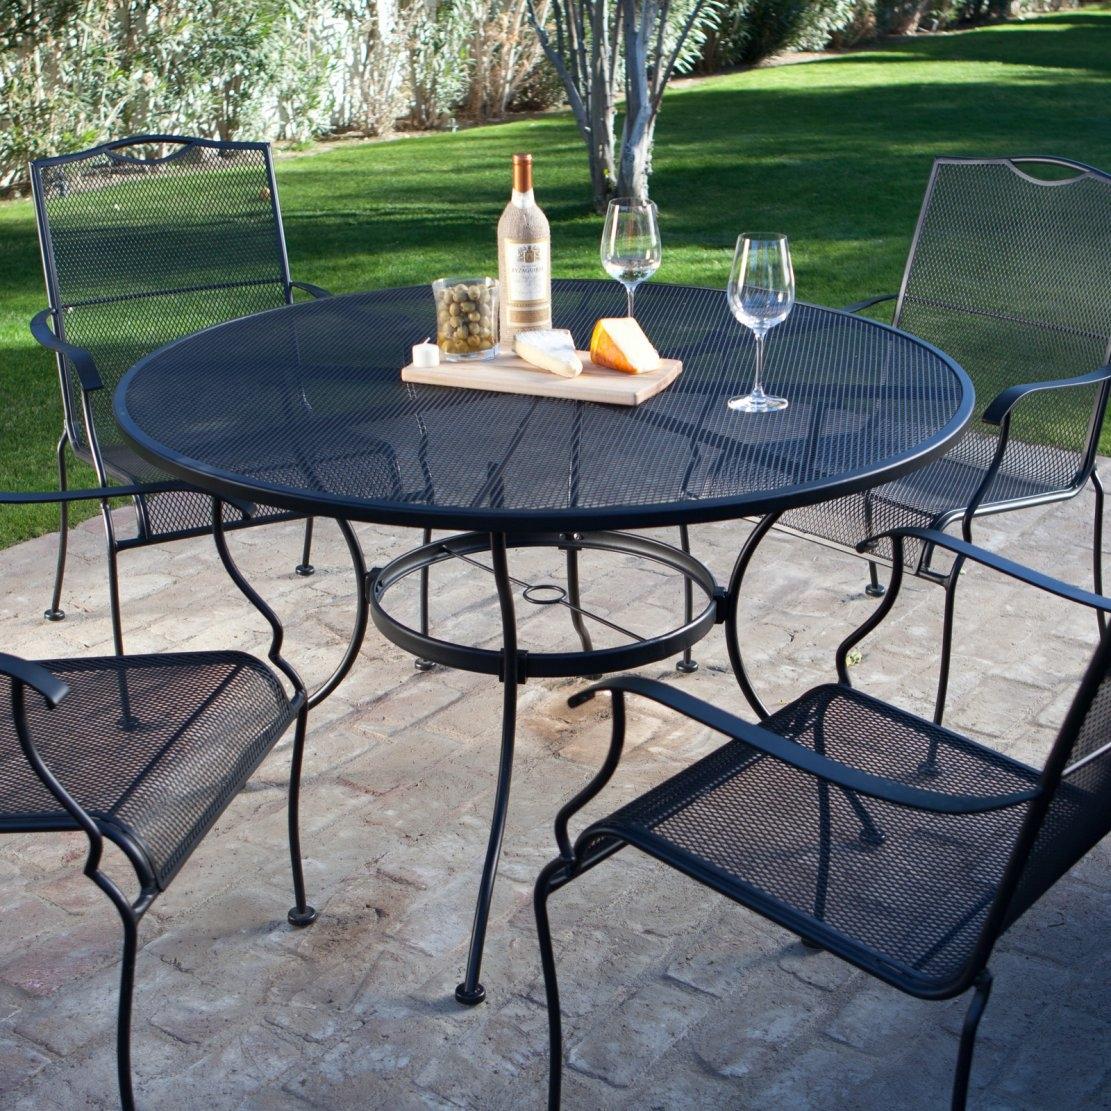 iron chair price metal rocking runners patio furniture set home decor